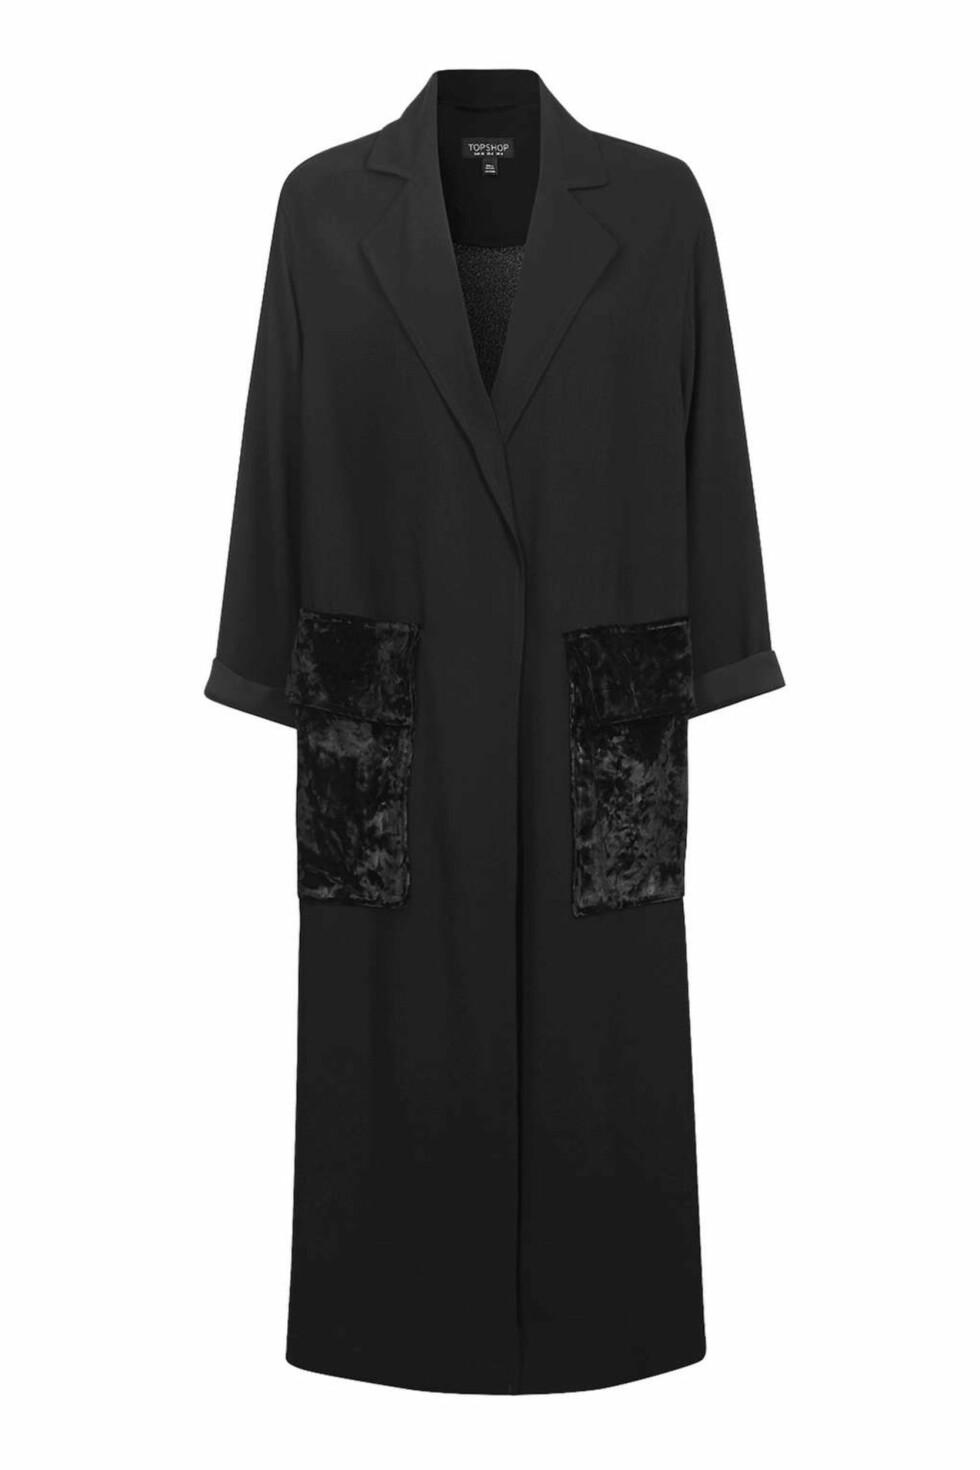 Kåpe fra Topshop   kr 750   http://www.topshop.com/en/tsuk/product/clothing-427/jackets-coats-2390889/velvet-pocket-duster-coat-5996081?bi=140&ps=20